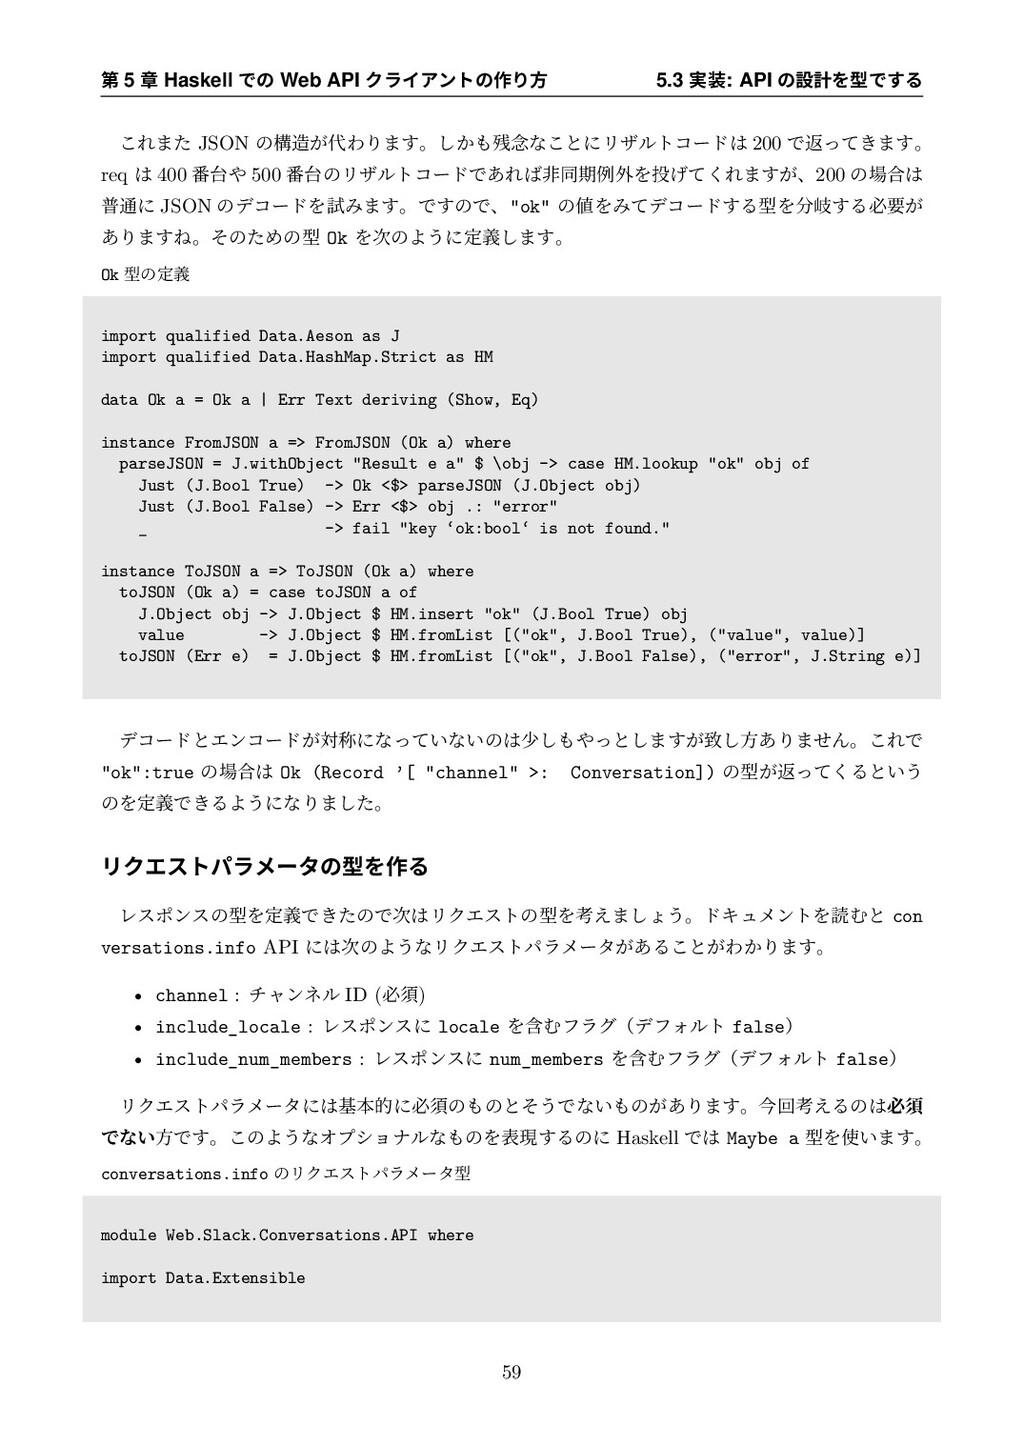 ୈ 5 ষ Haskell Ͱͷ Web API ΫϥΠΞϯτͷ࡞Γํ 5.3 ࣮: API...